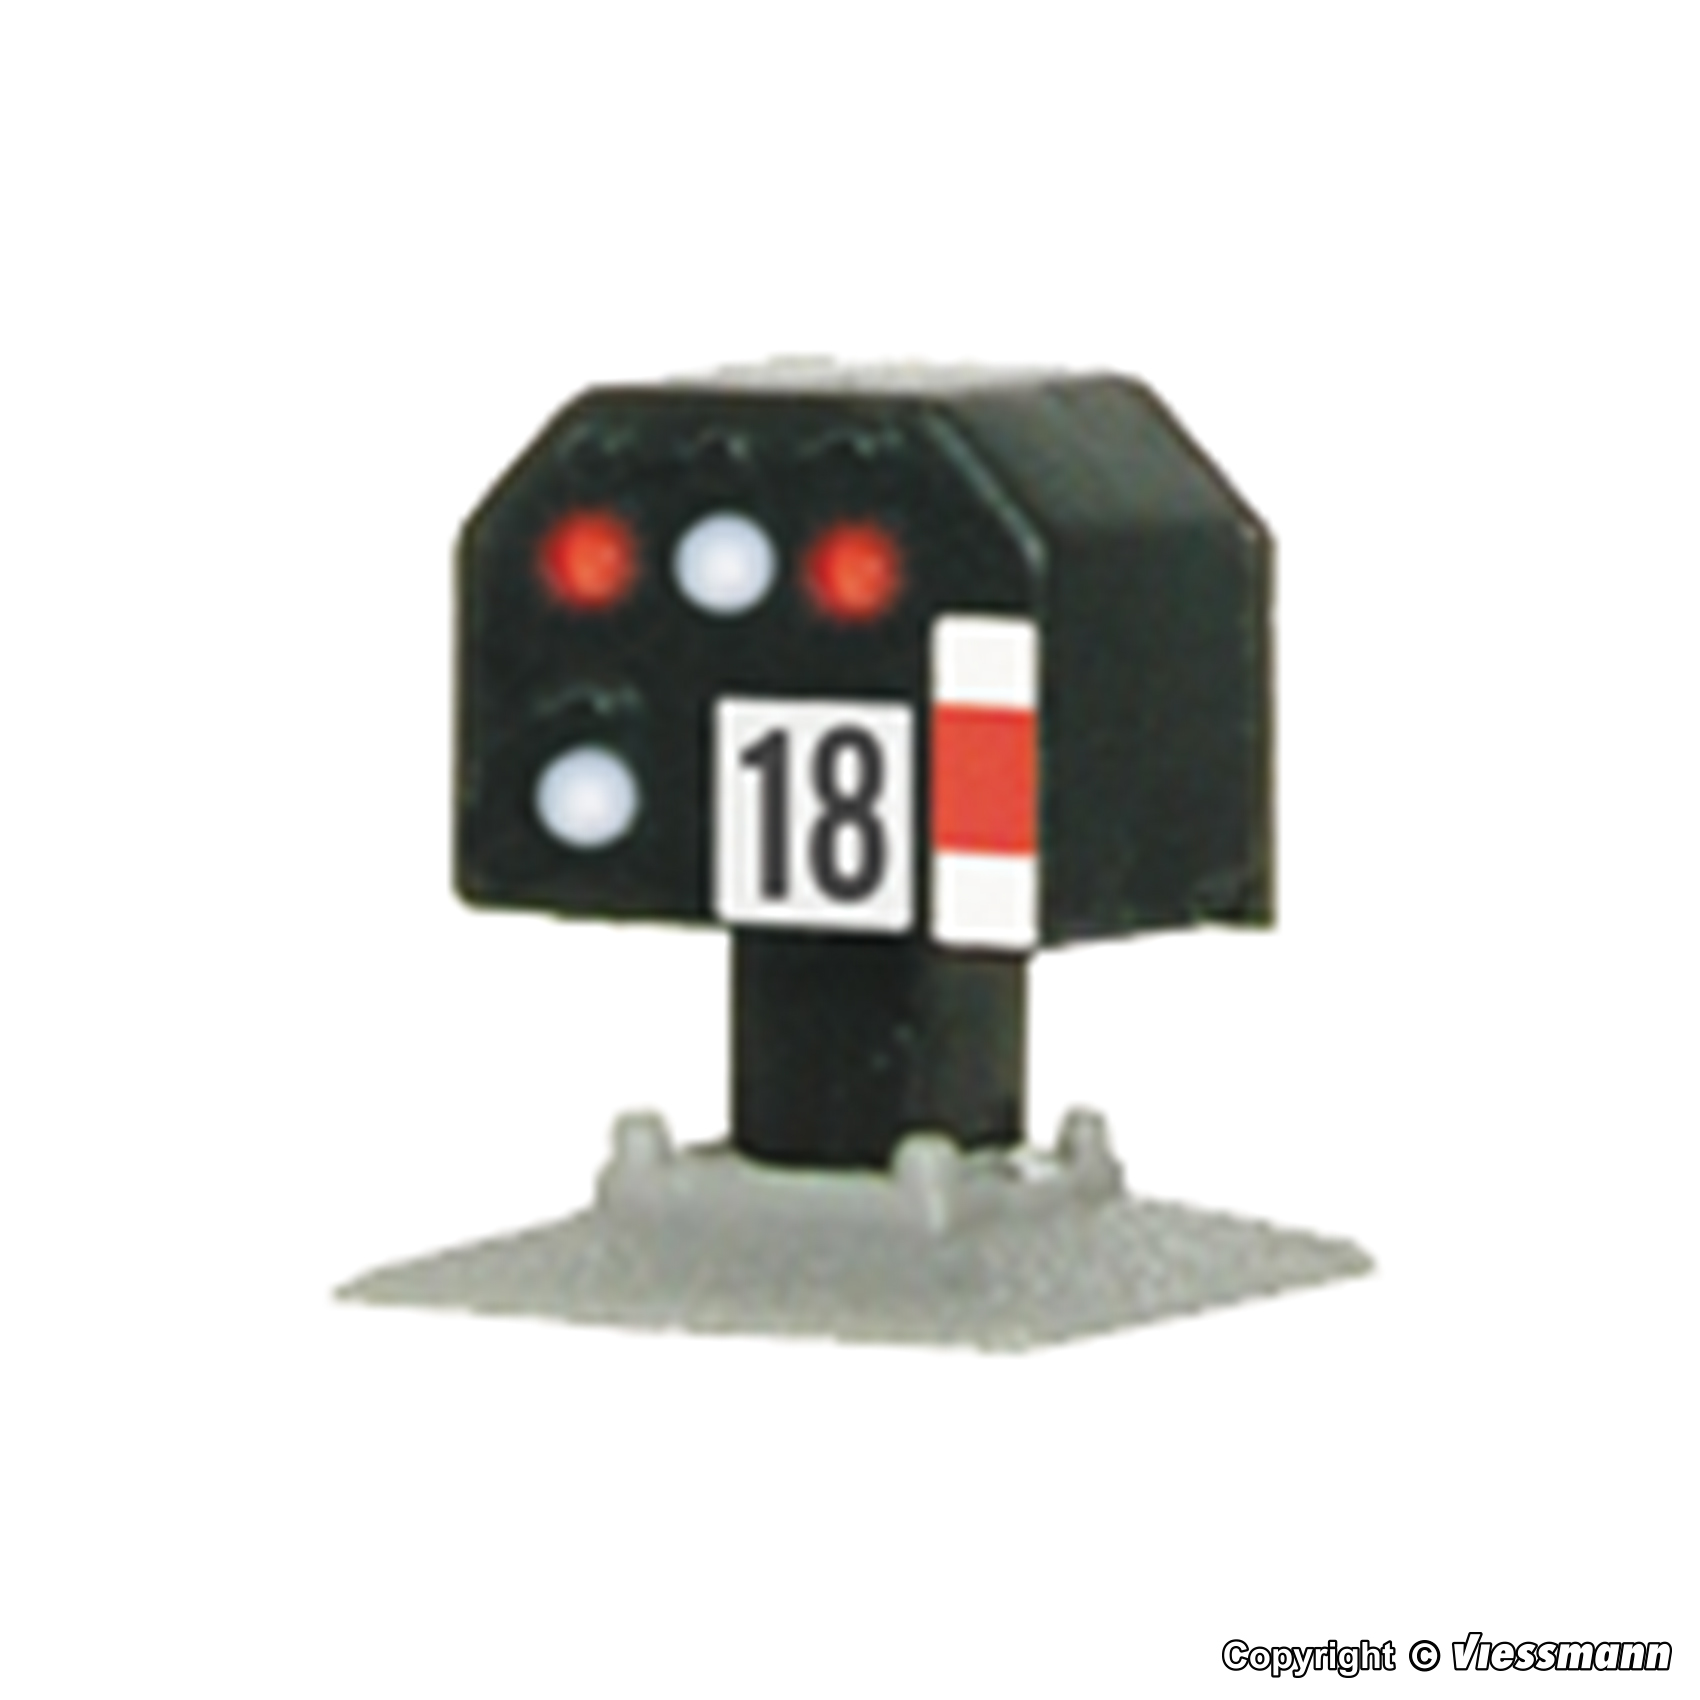 /N Light Blocking Signal Viessmann 4418/ Low